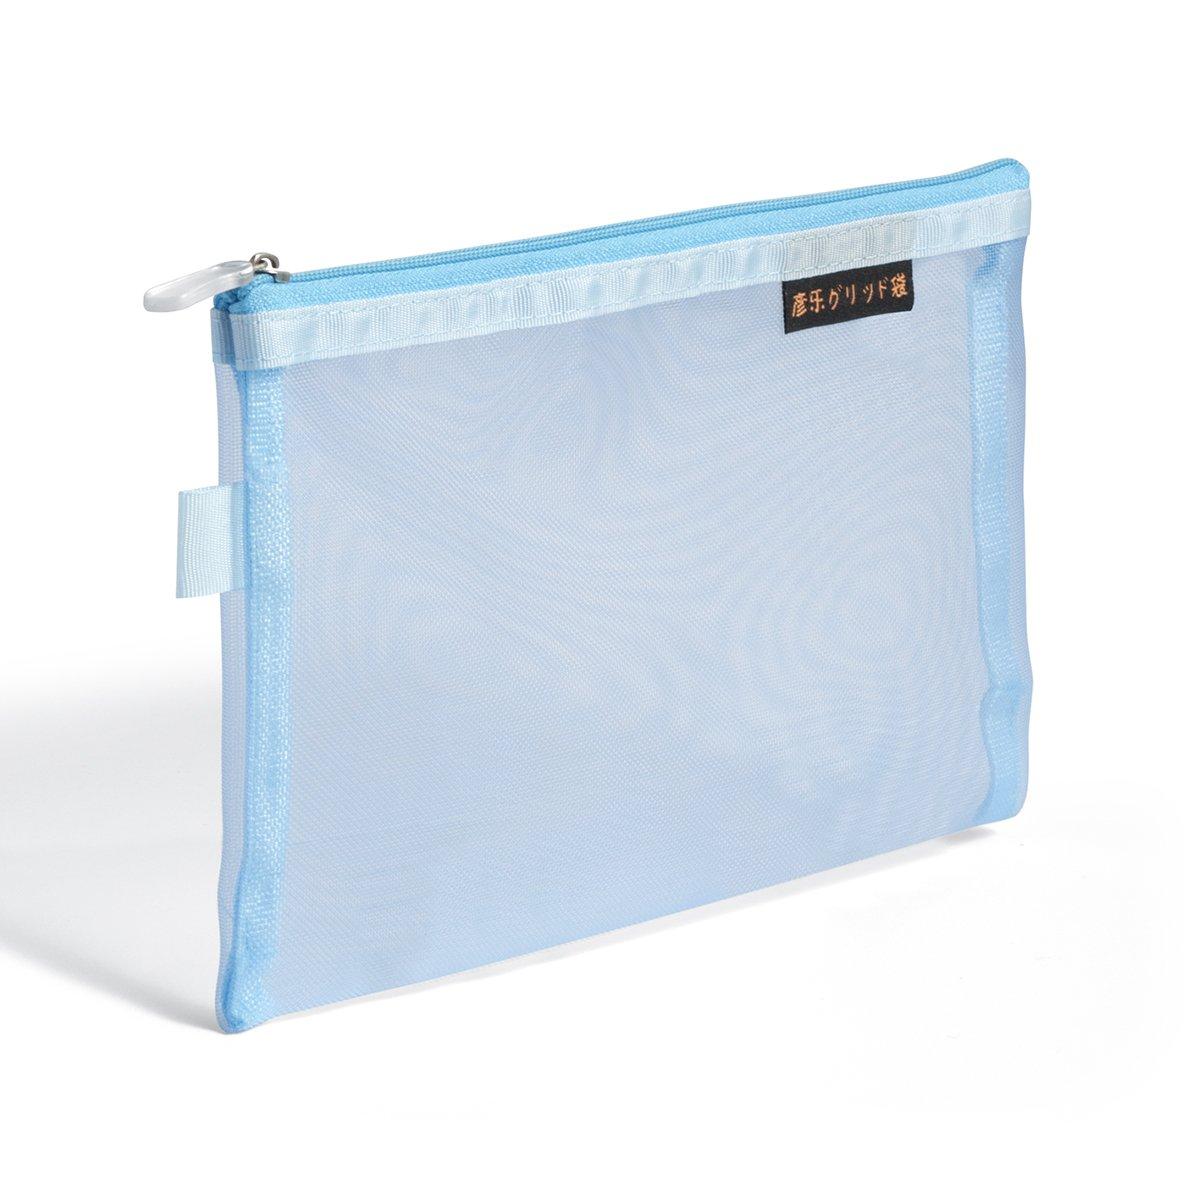 Gary Set of 2 Pencil Case Mesh Square Zipper Pencil Pen Bag Transparent Mesh Pencil Case for School or Office